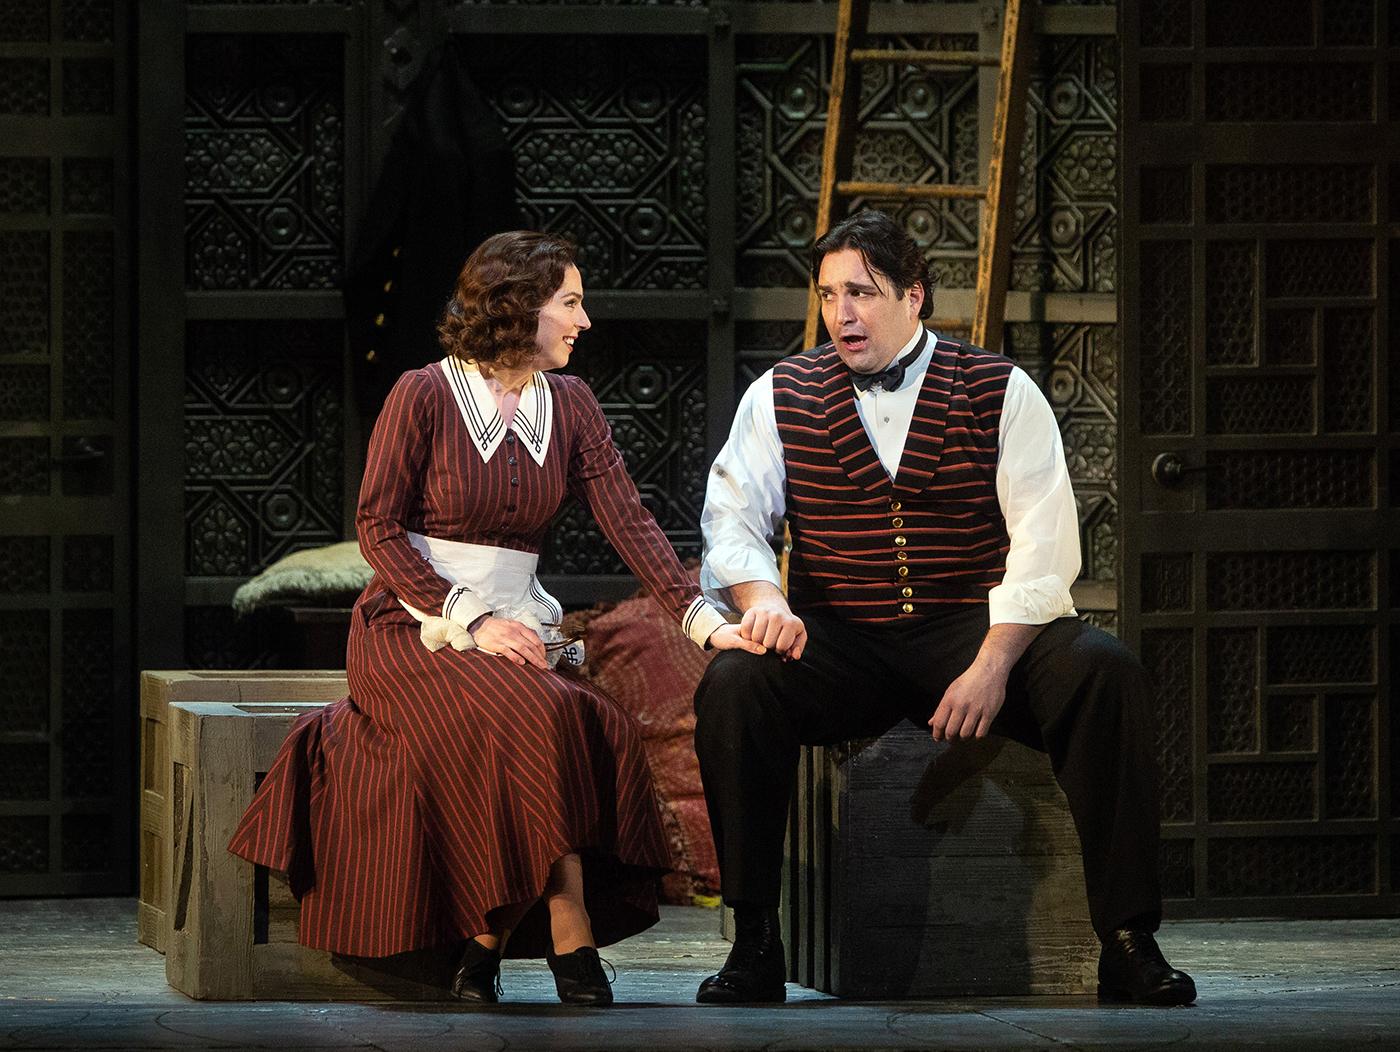 Le Nozze Di Figaro at the Met